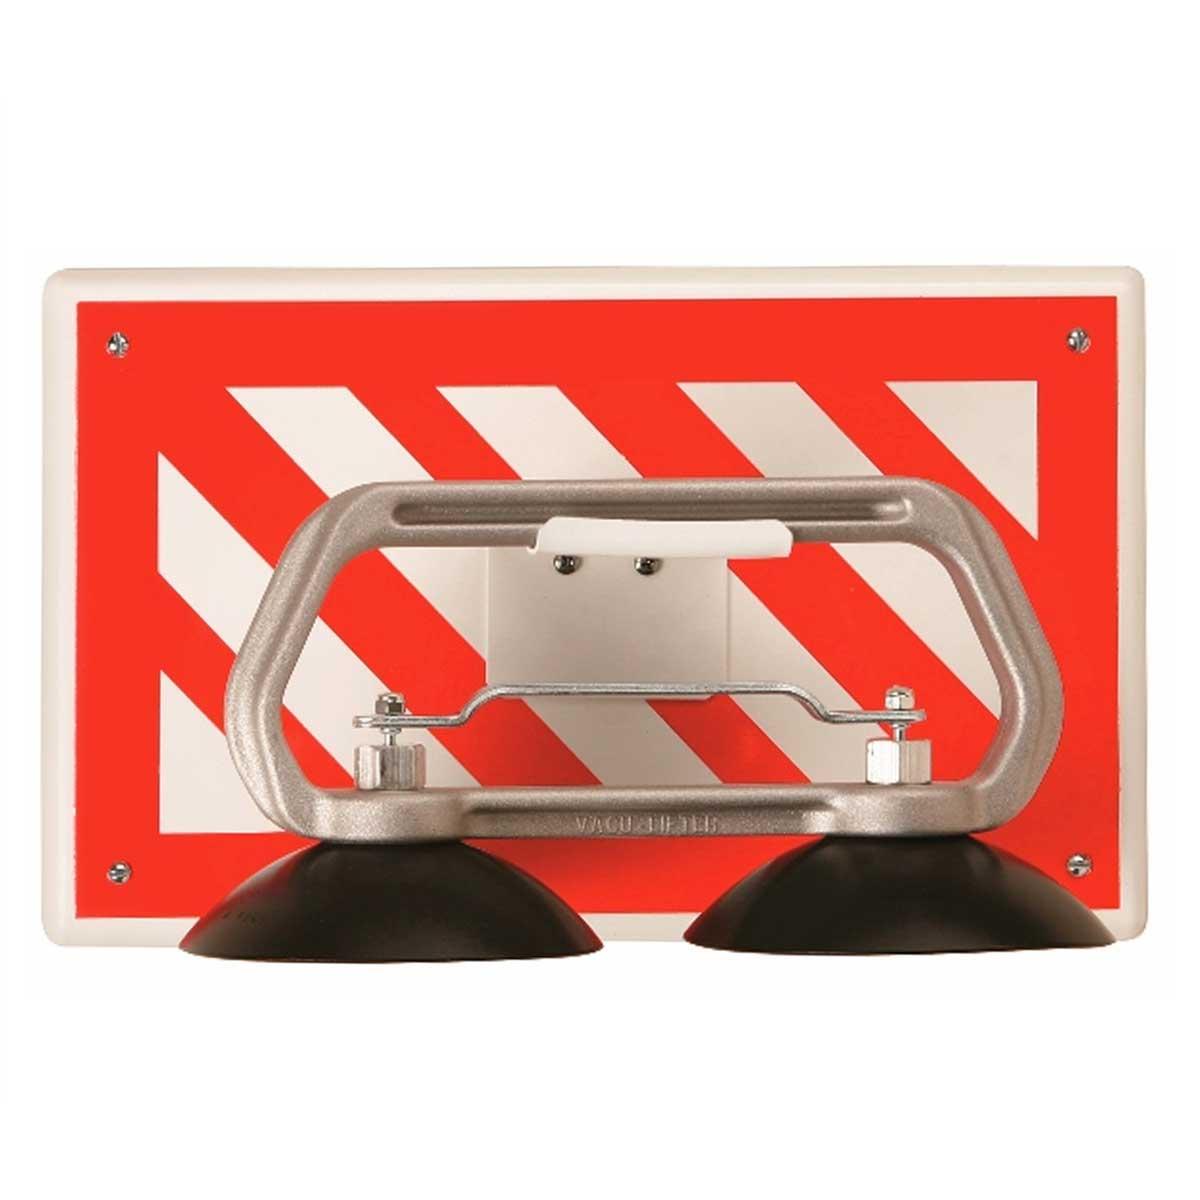 red strip metal wall bracket floor tile puller holder